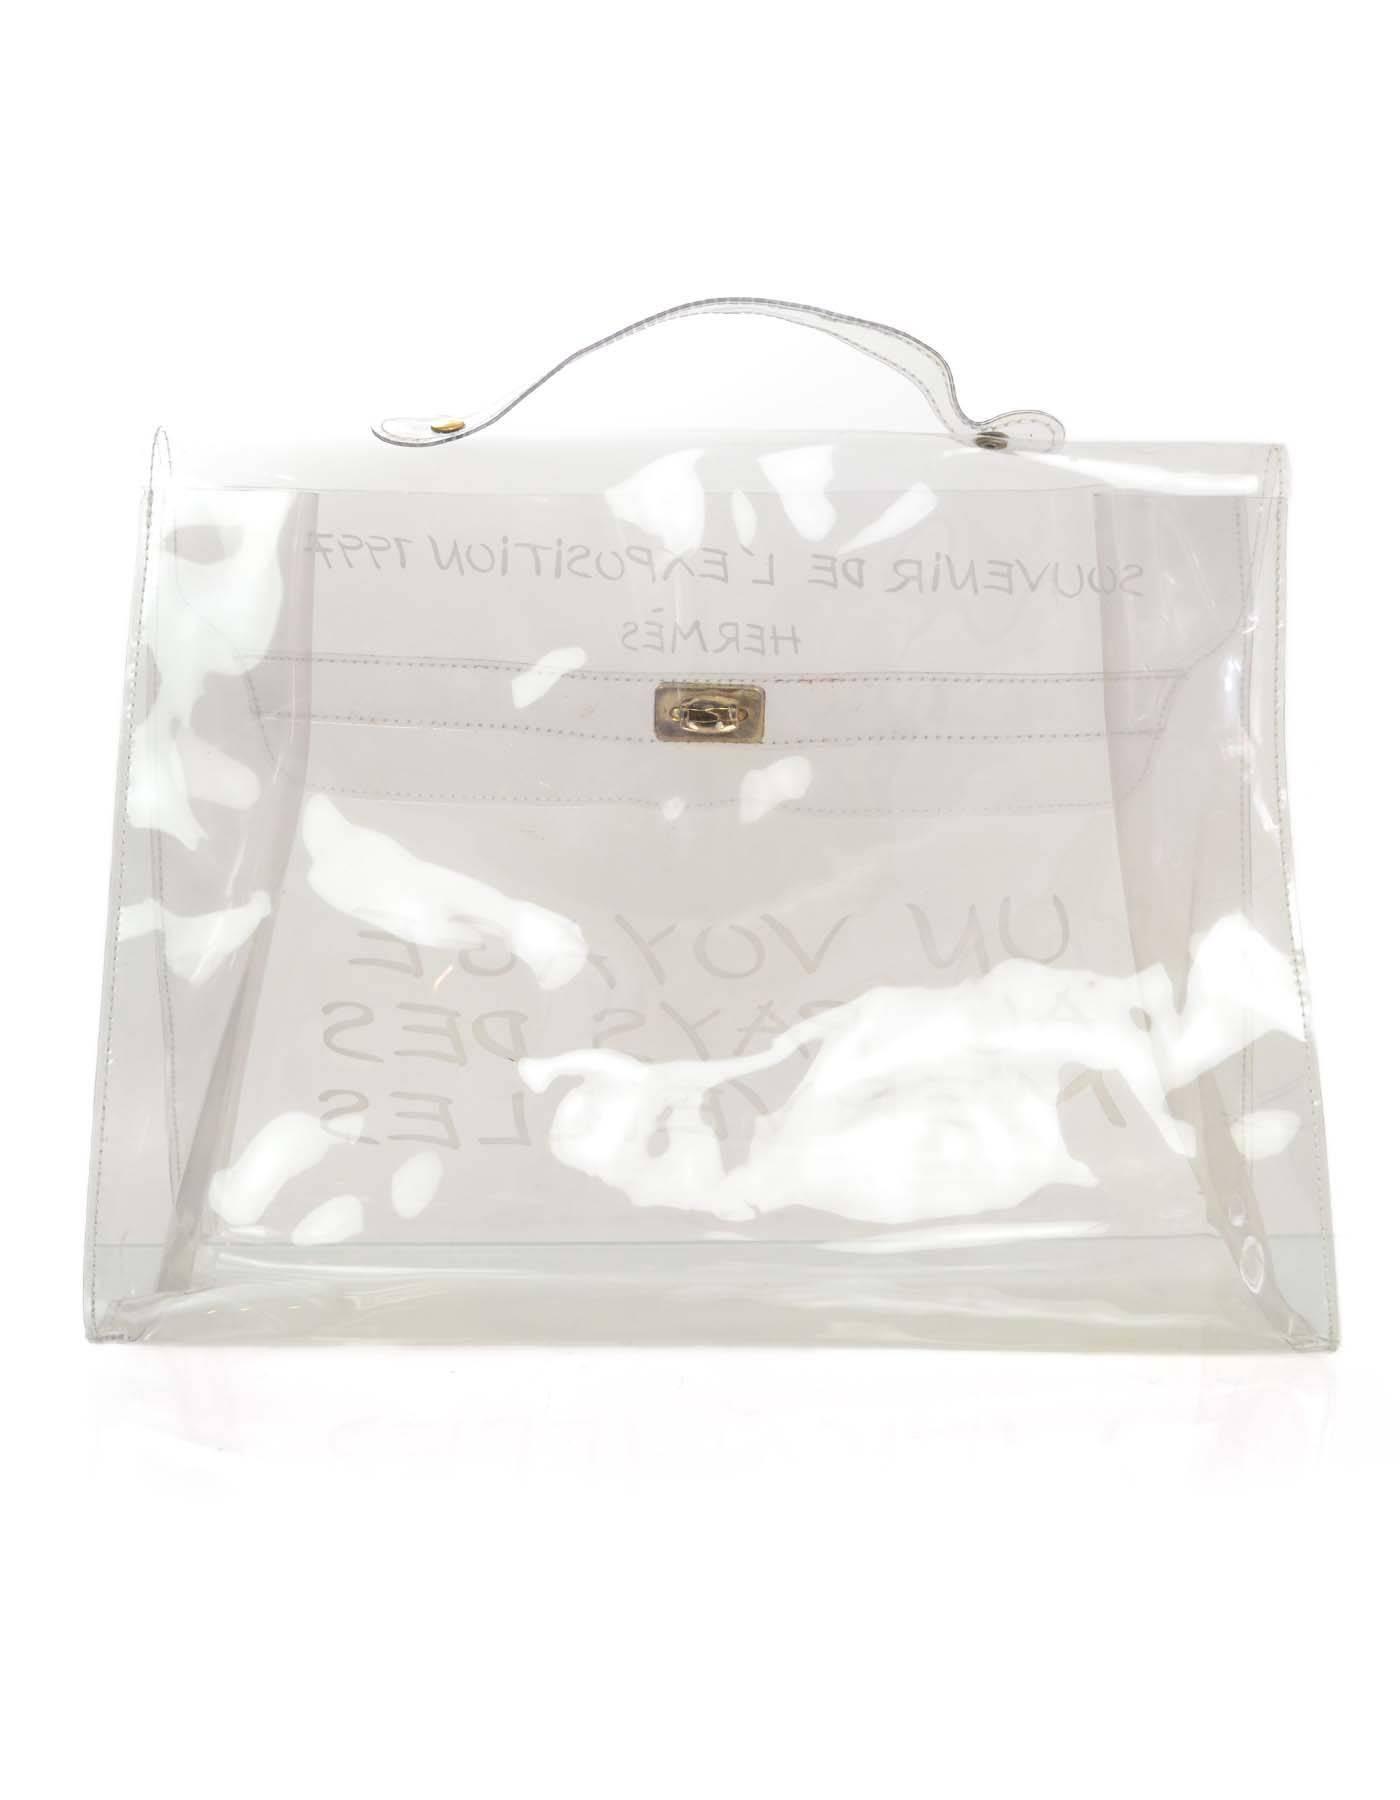 2730e7062b0 Hermes Clear Plastic Un Voyage Kelly Souvenir Tote Bag at 1stdibs